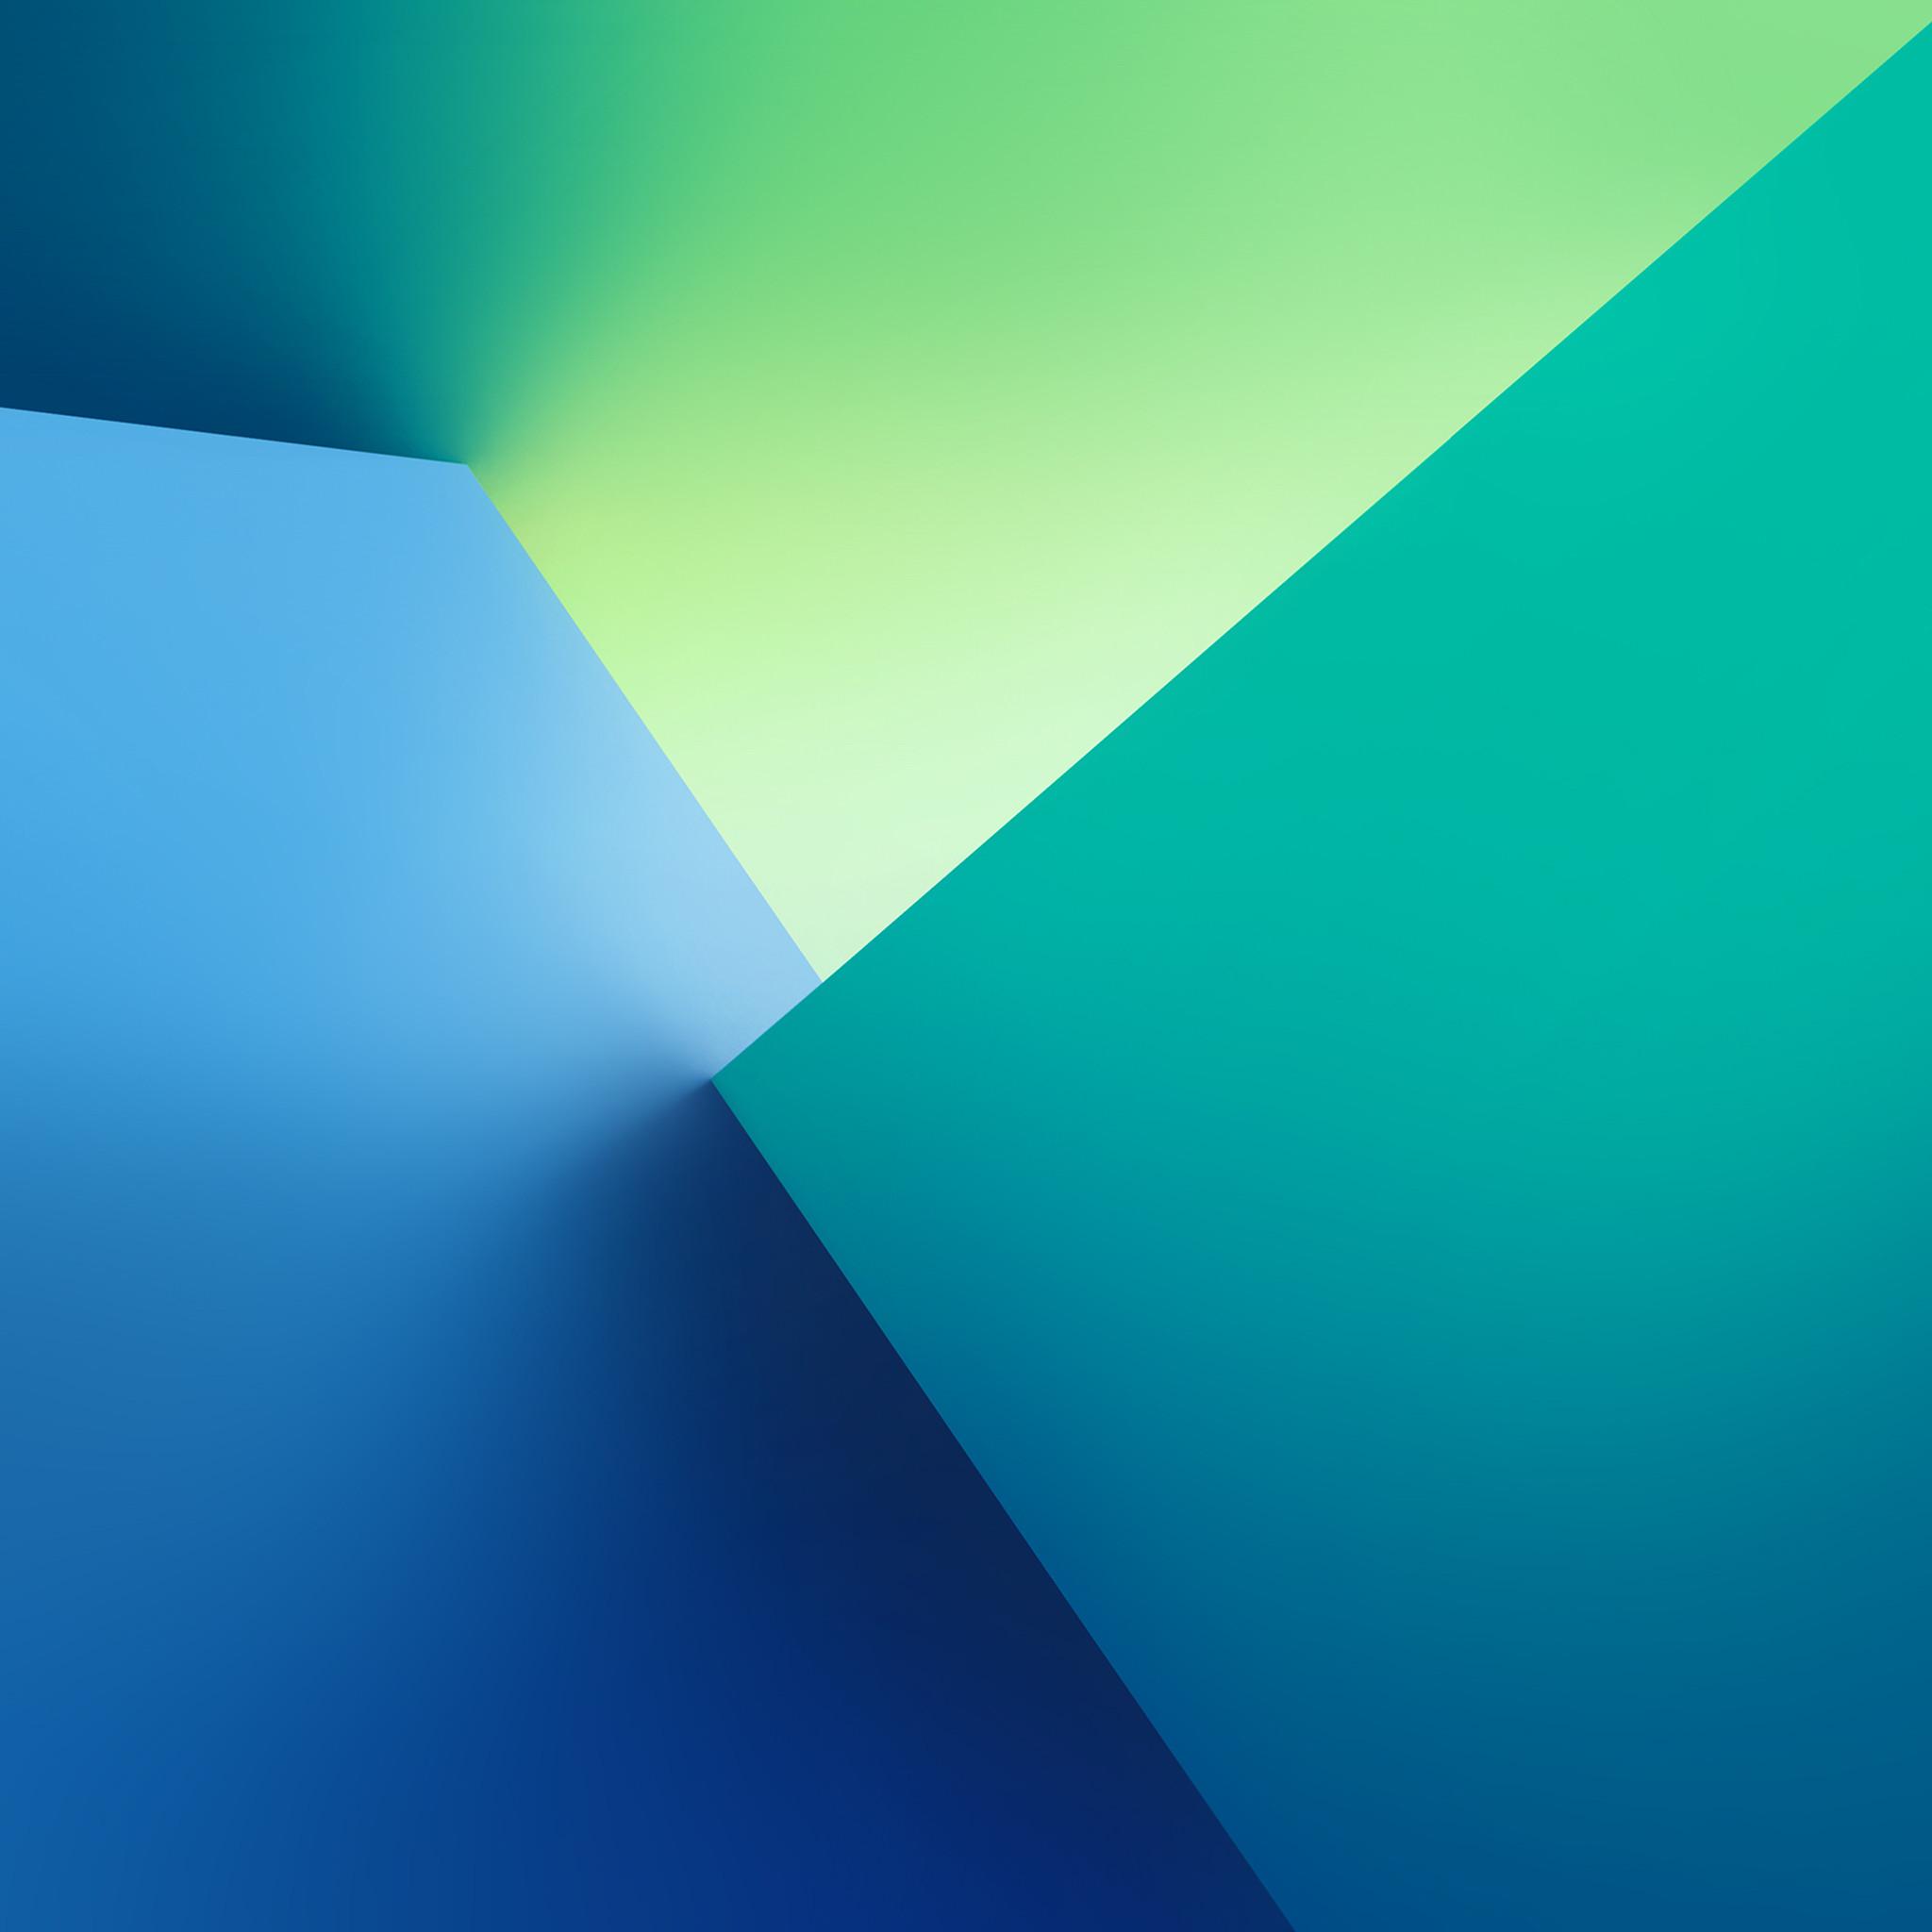 Samsung galaxy s3 wallpaper hd download